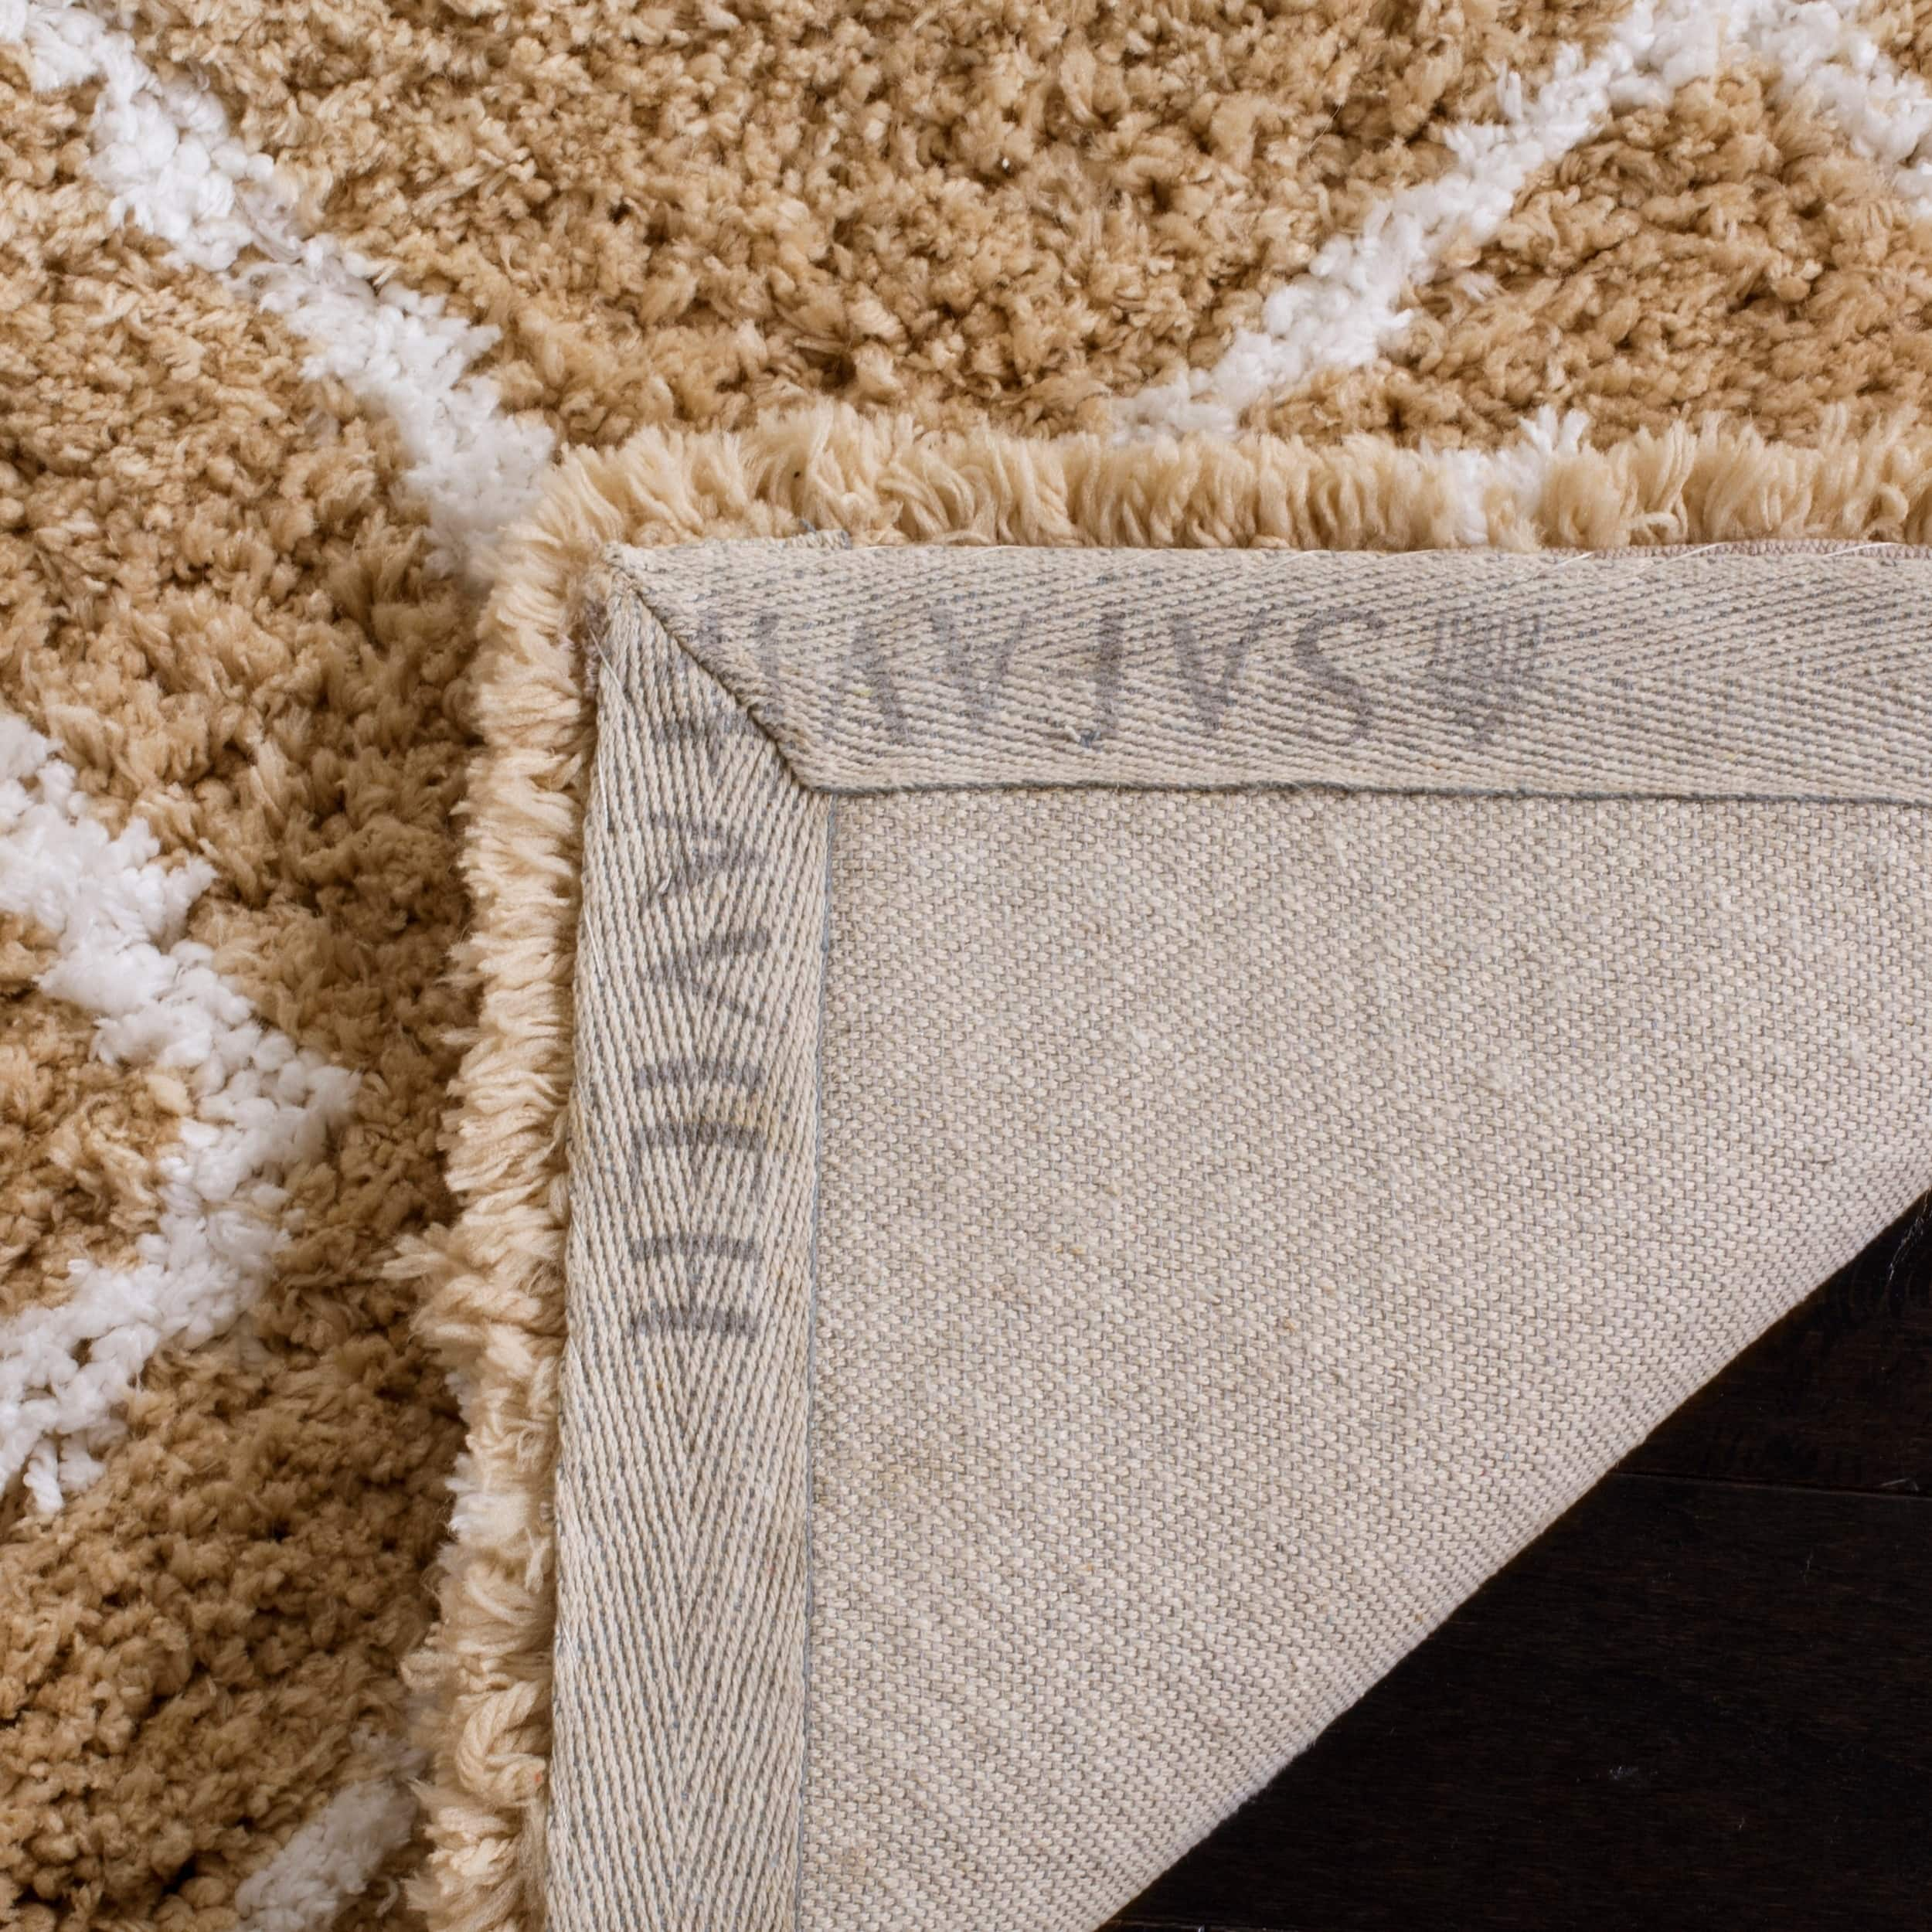 Buy Area Rugs Online At Overstock.com